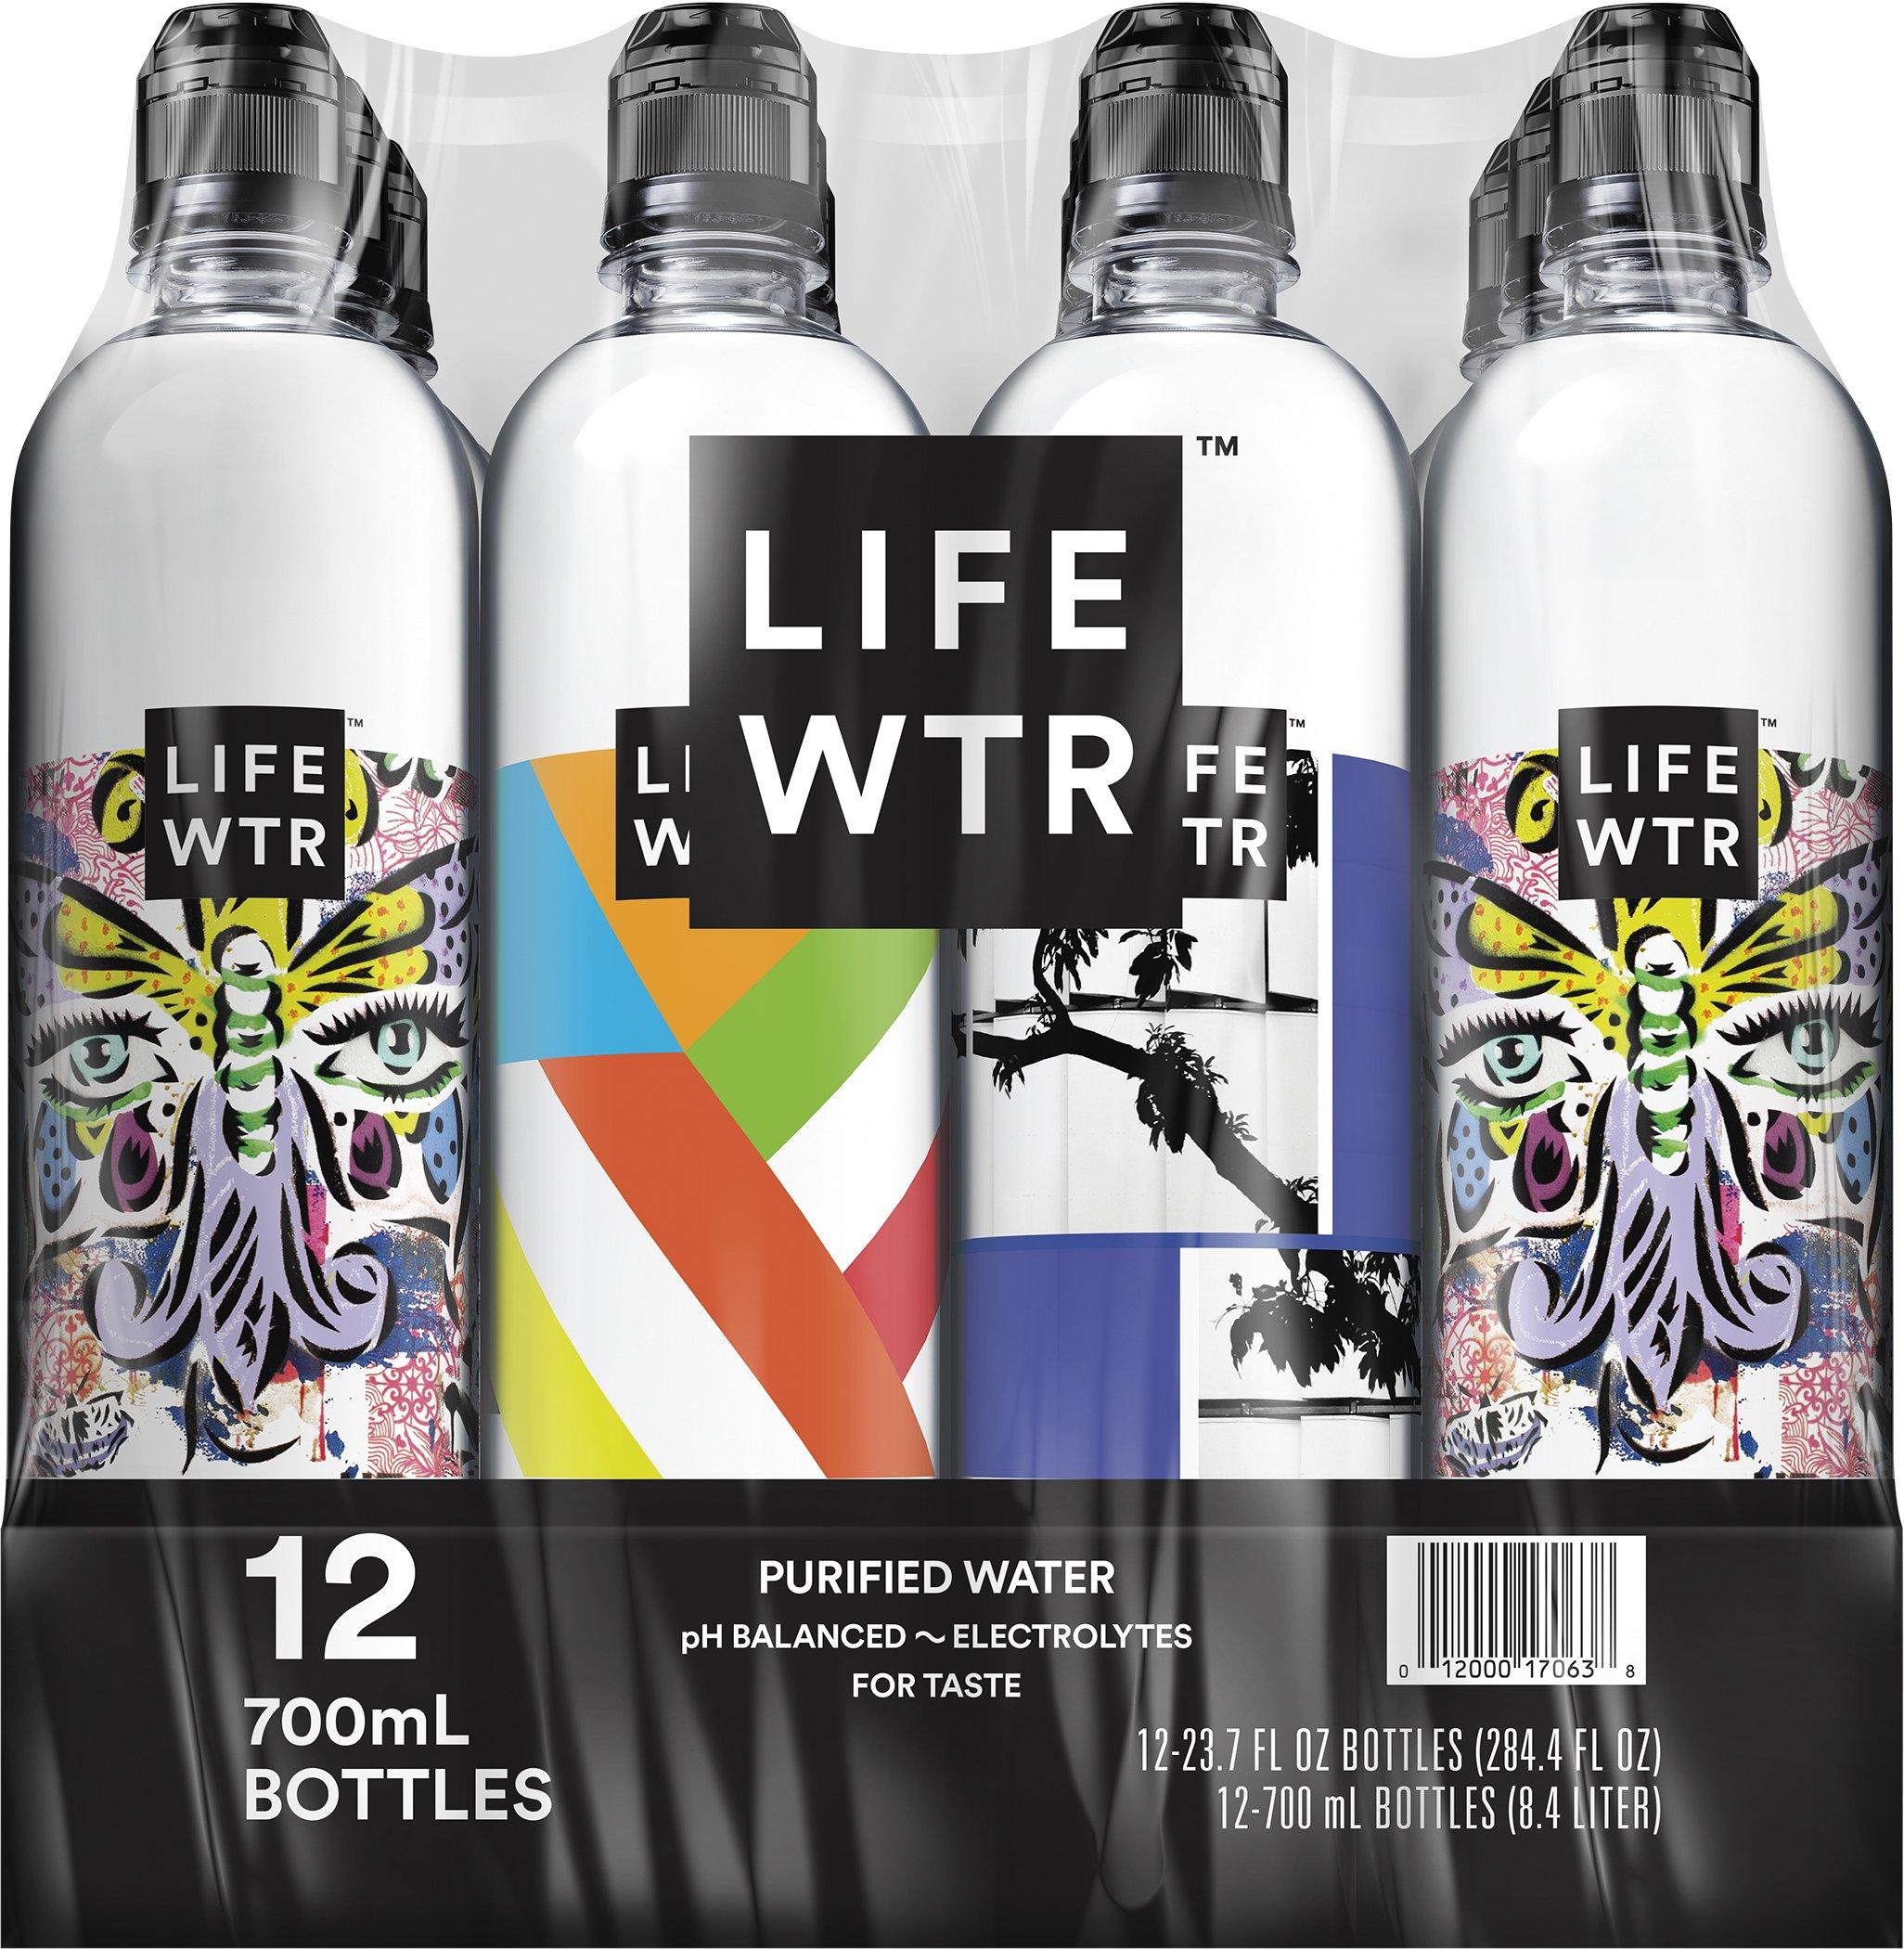 LIFEWTR, Premium Purified Water, pH Balanced with Electrolytes For Taste, 700 mL flip cap bottles (Pack of 12) (Packaging May Vary)